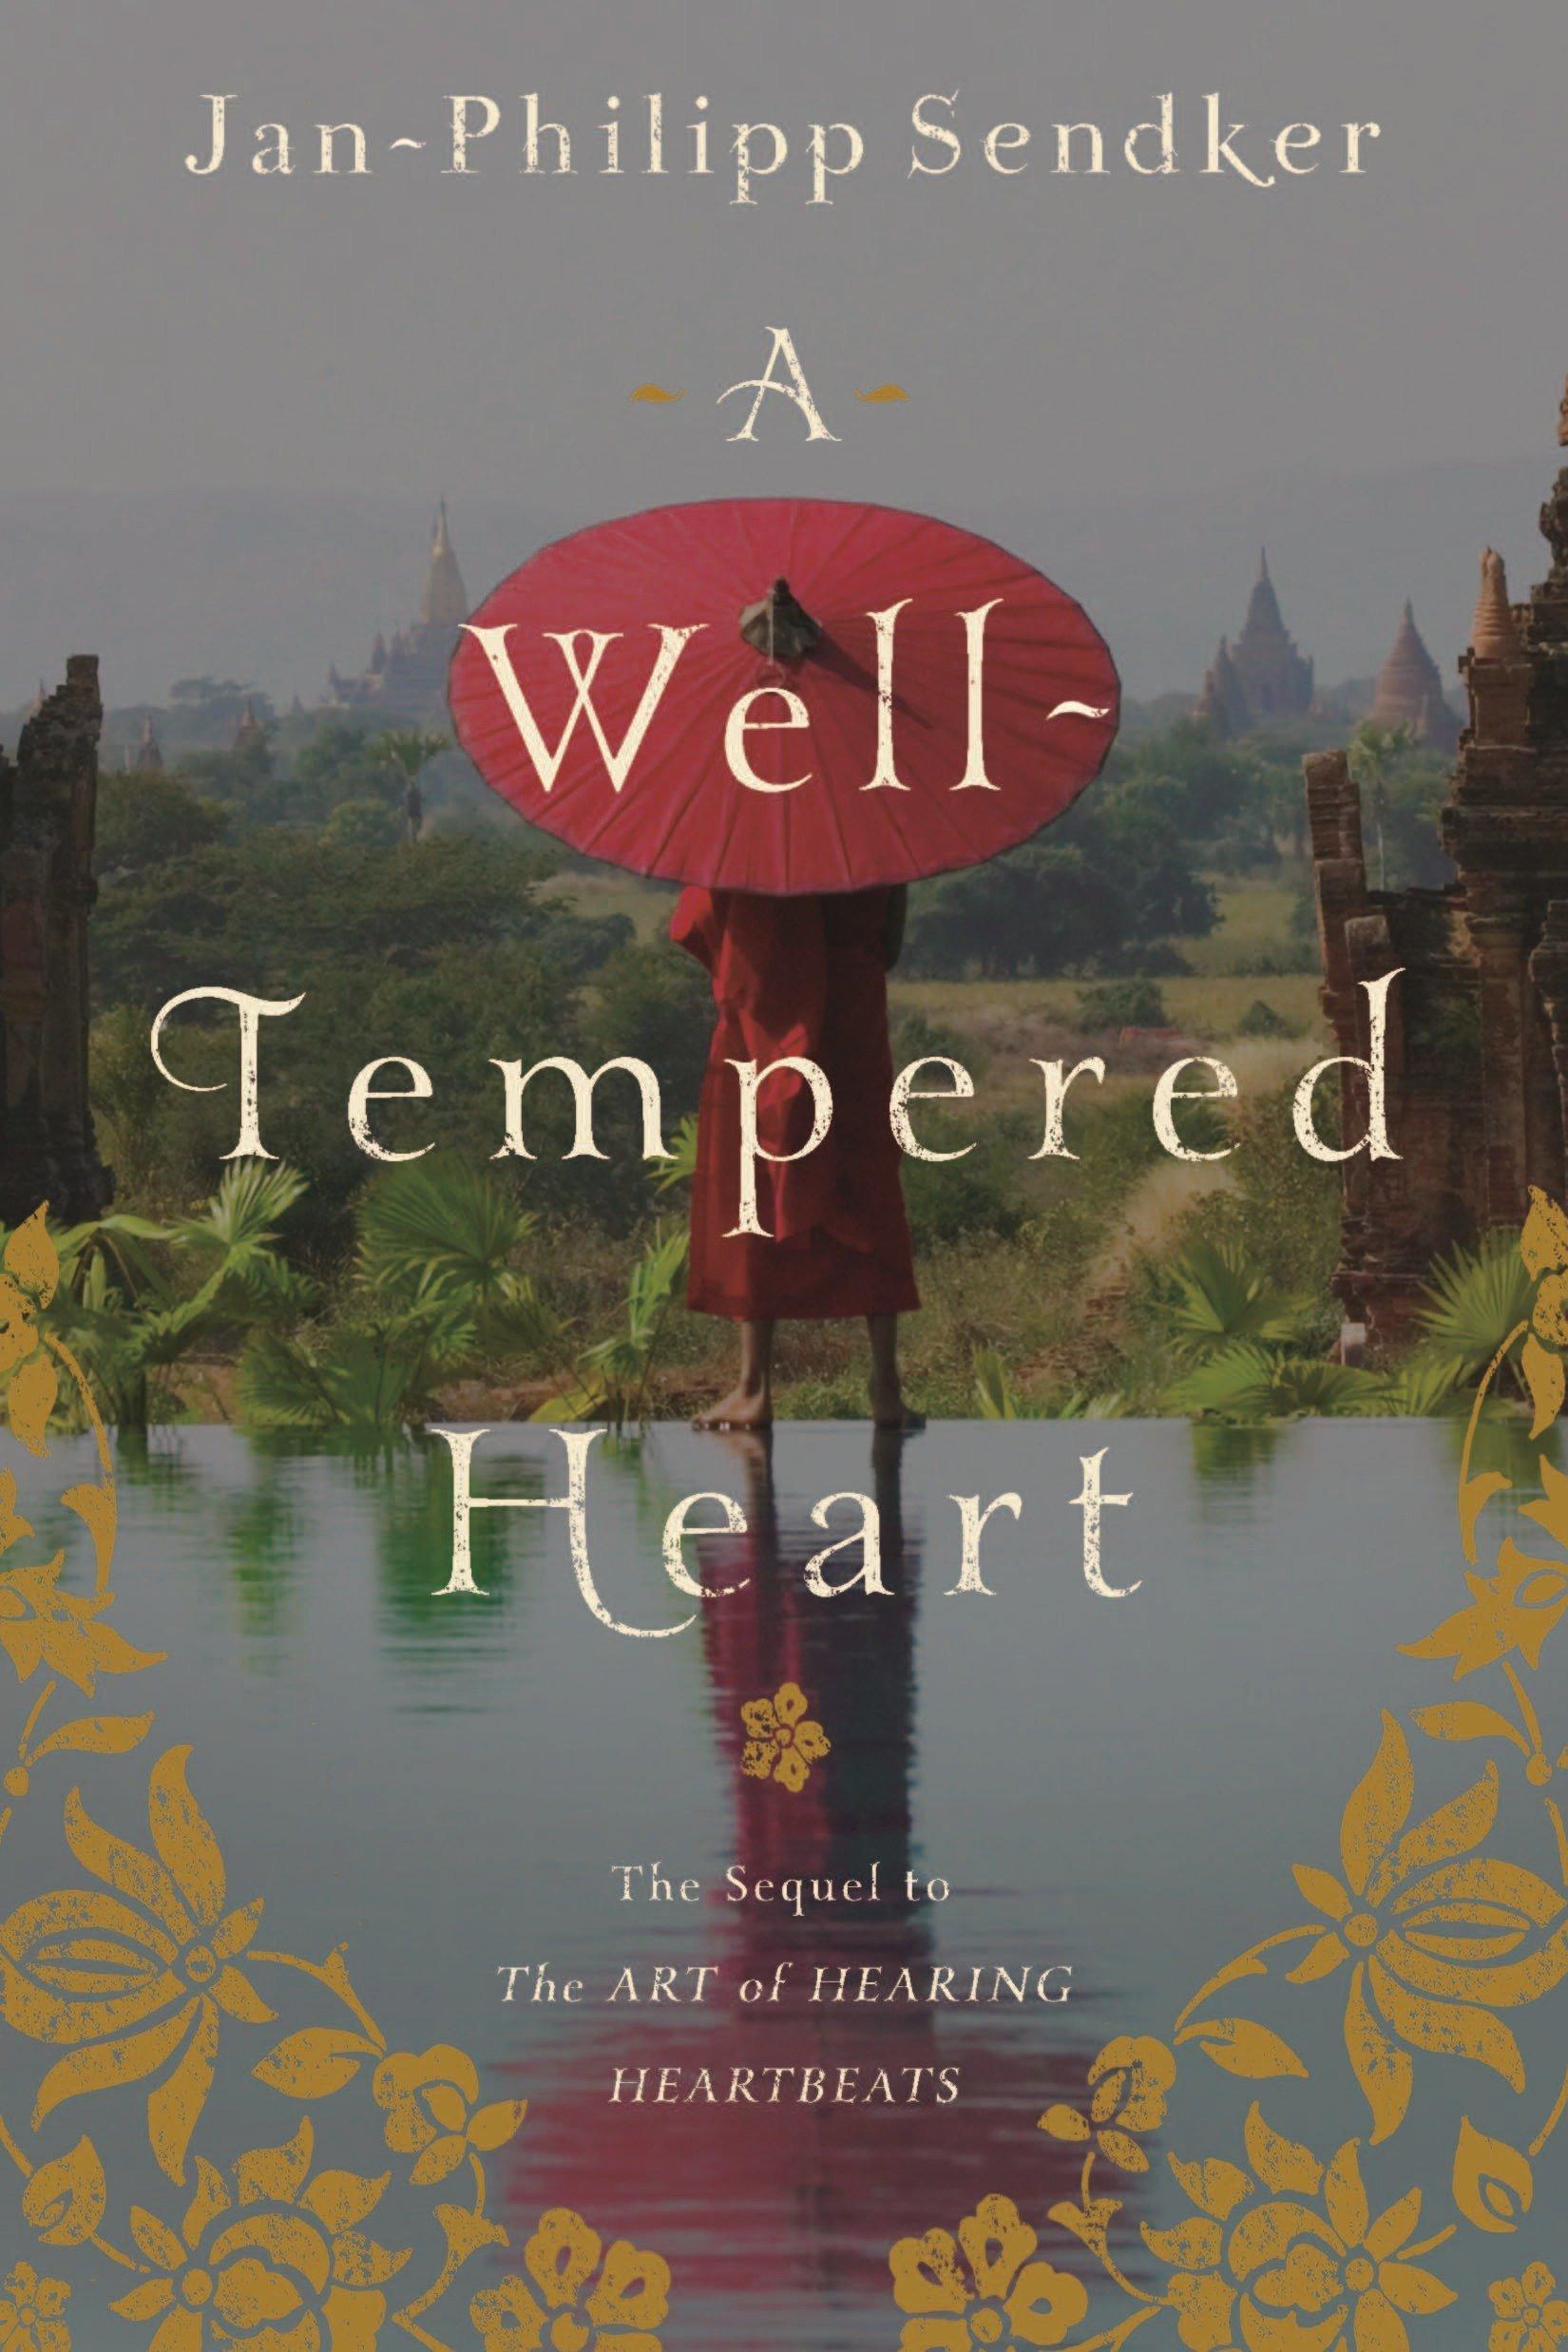 A Well-Tempered Heart (Art of Hearing Heartbeats)